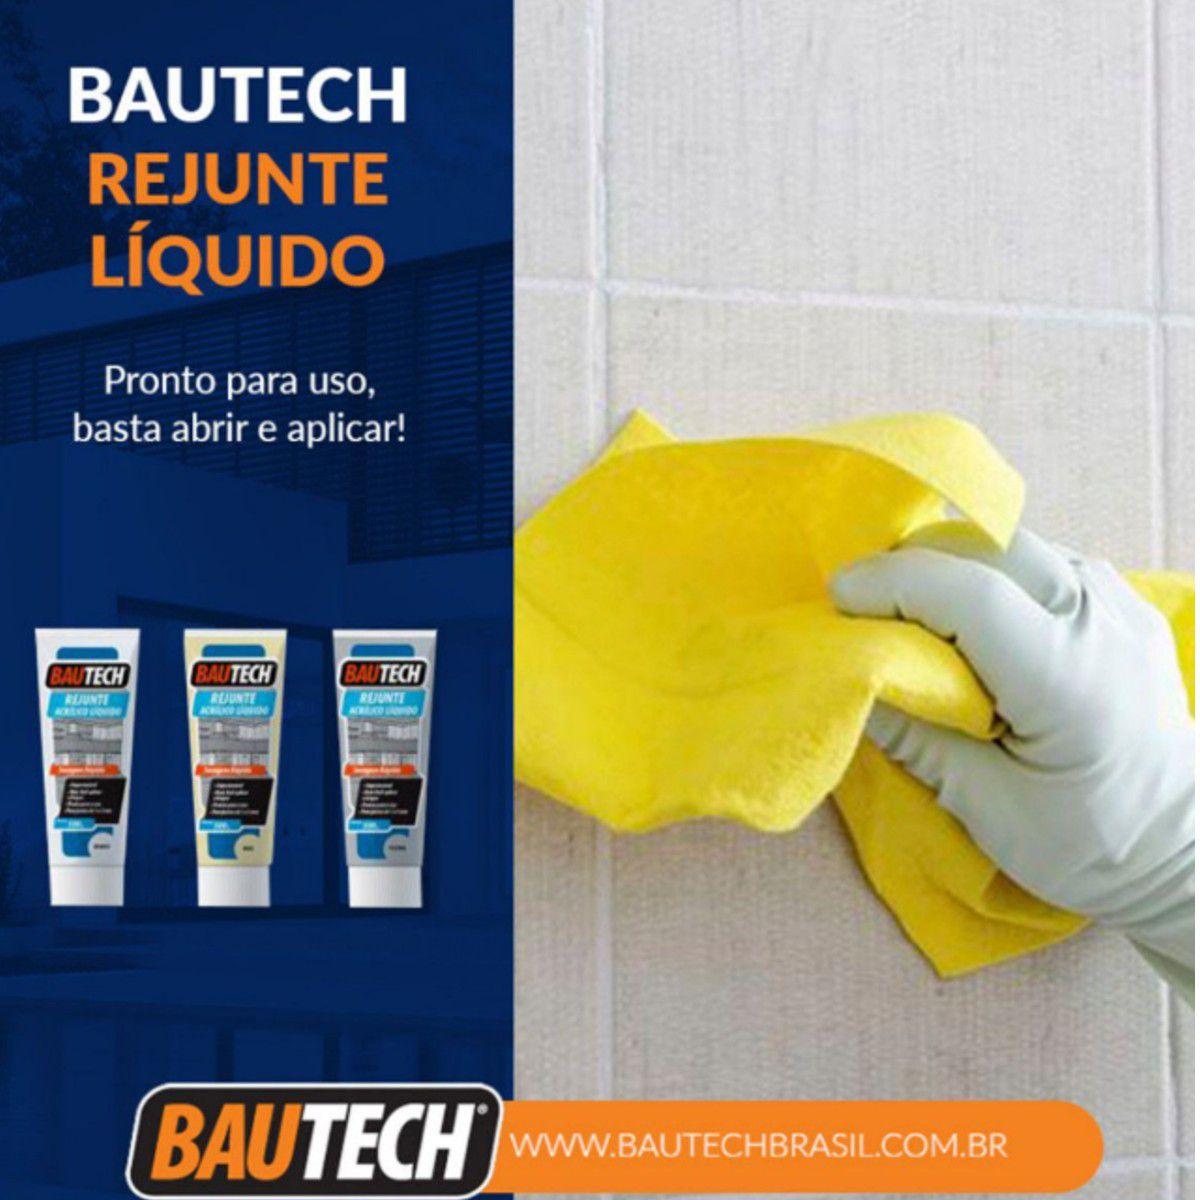 Rejunte Acrílico Liquido Bautech Platina 470g